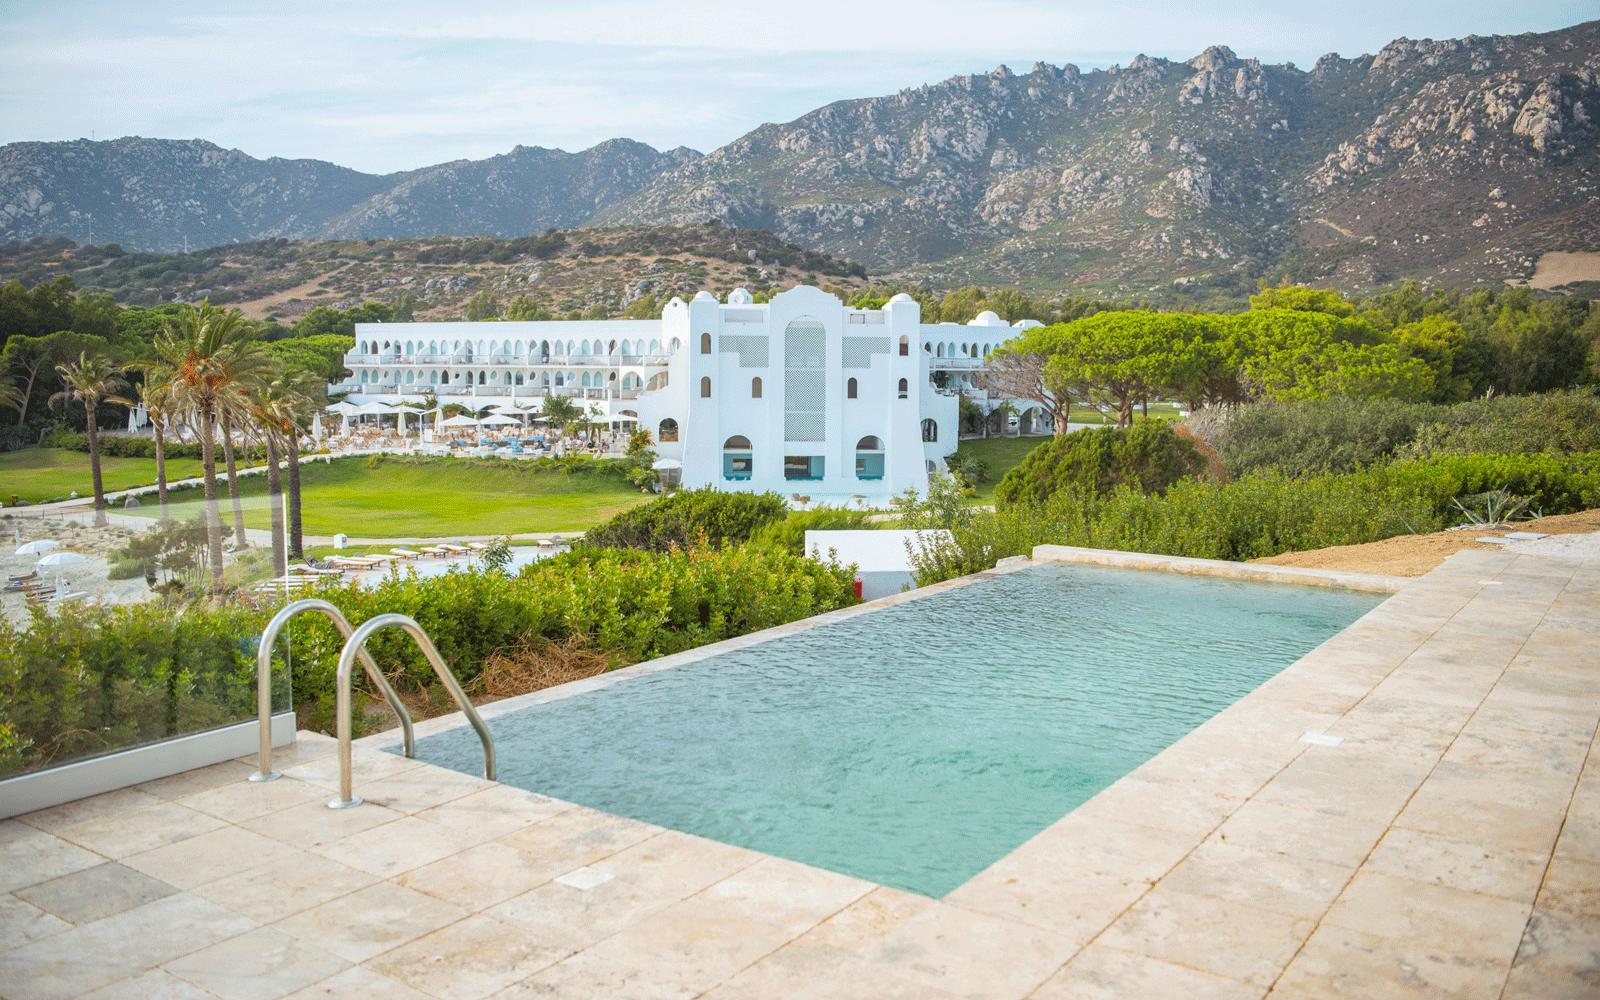 Resort Capo Boi: Villa Bellavista